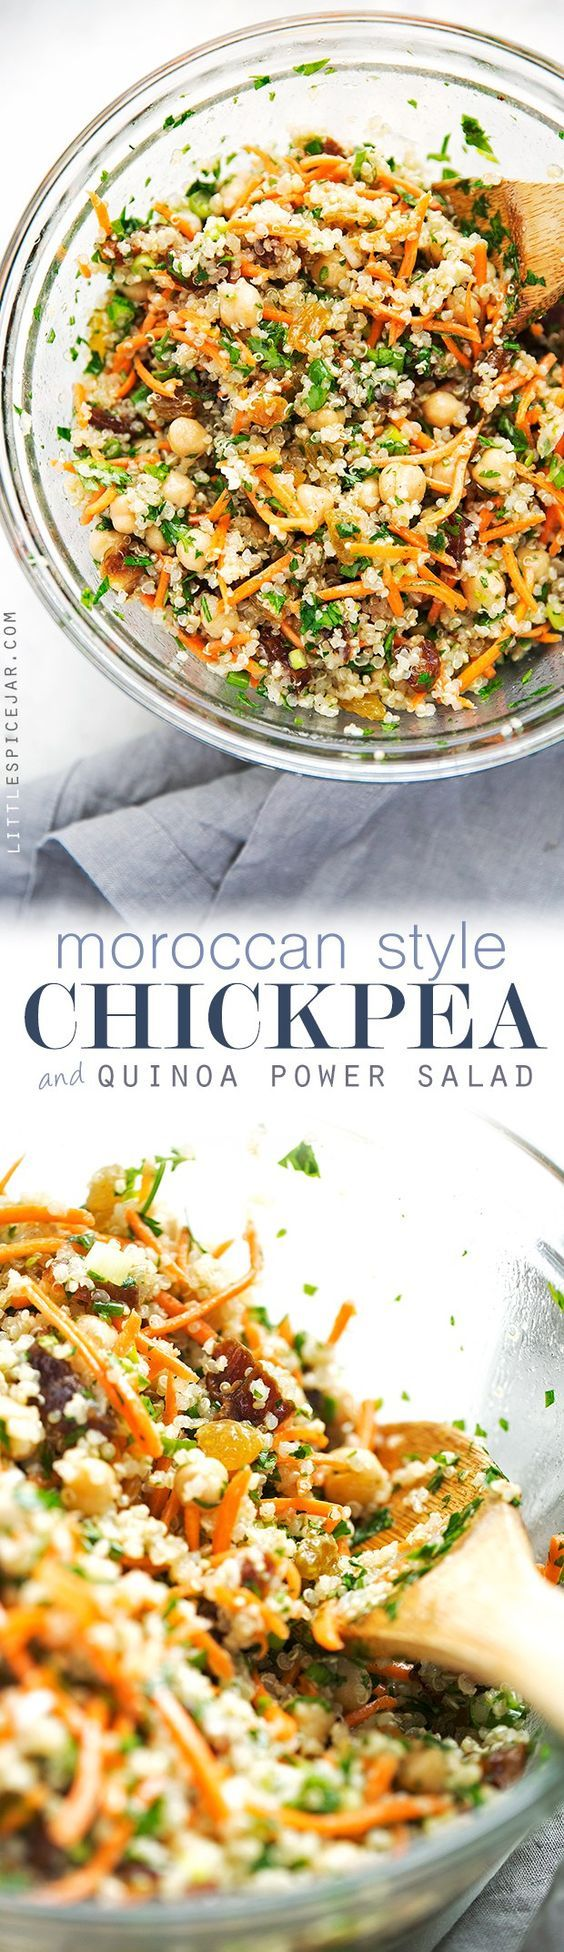 moroccan chickpea quinoa power salad with figs & golden raisins